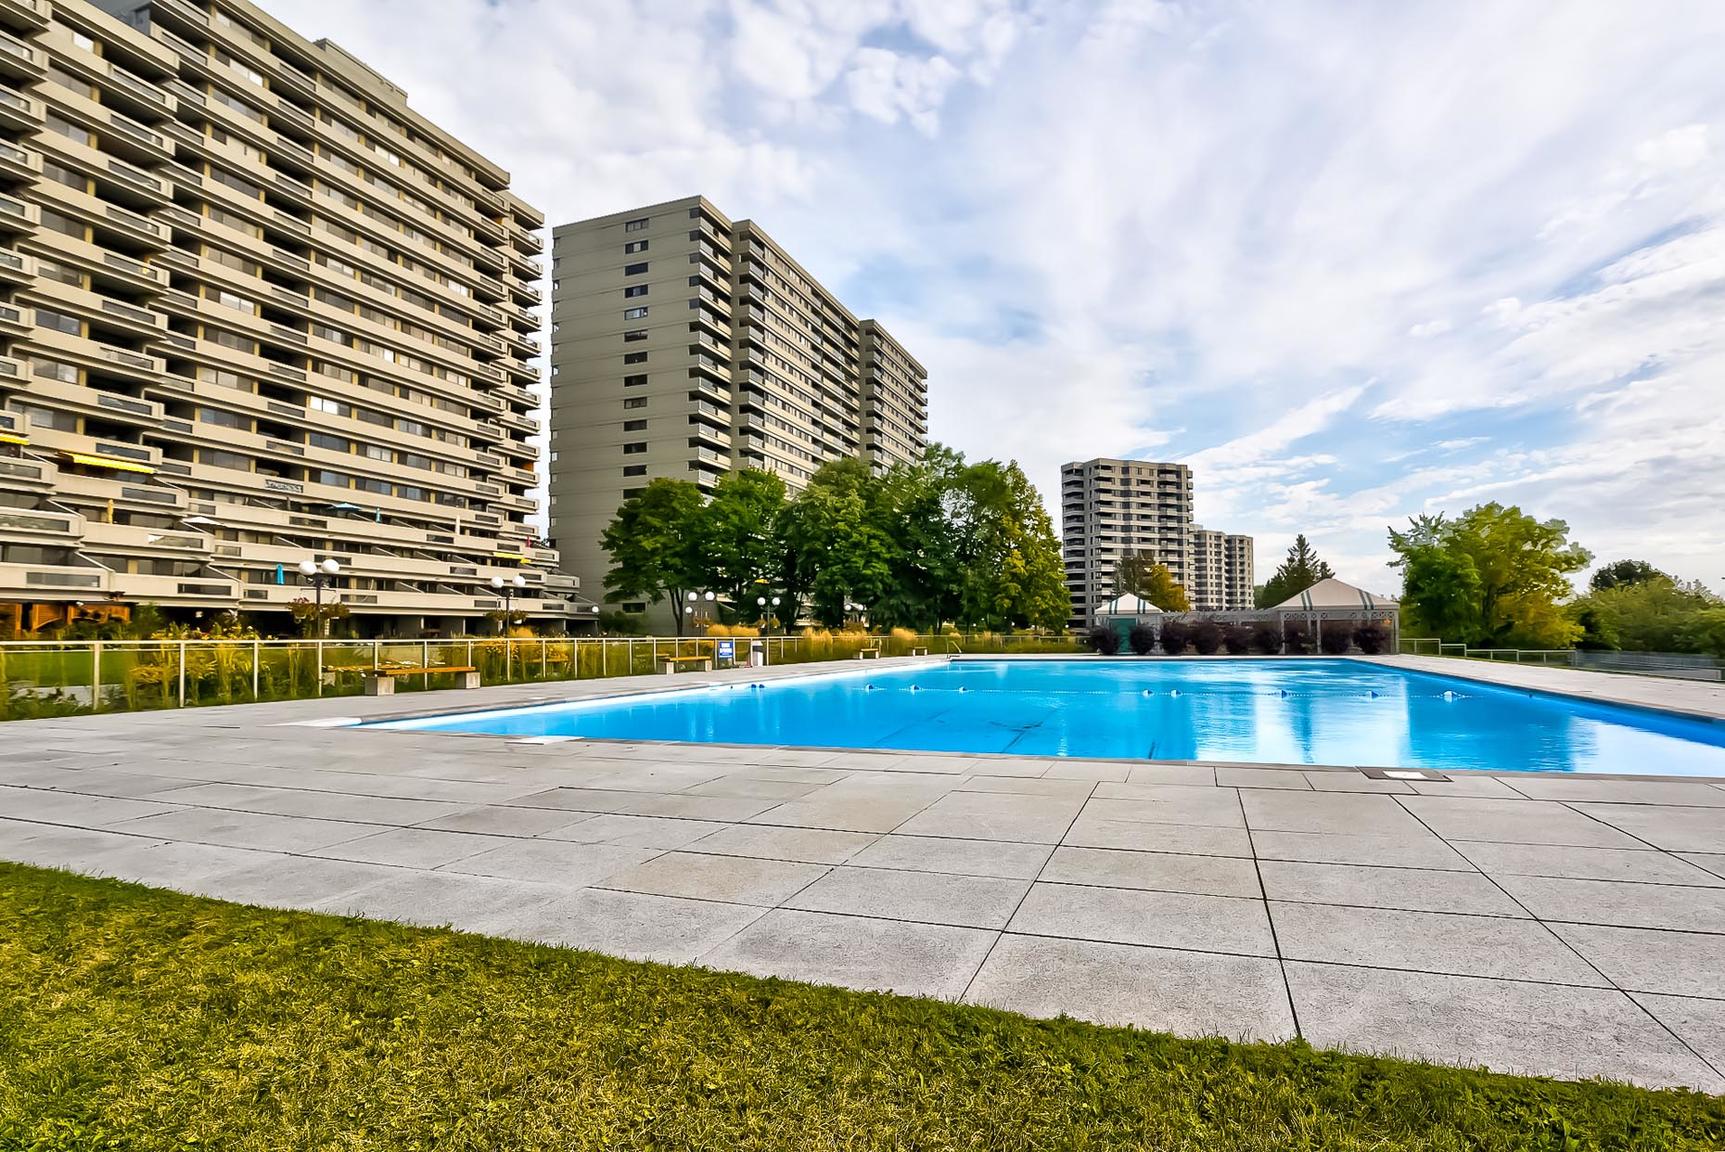 1 bedroom Apartments for rent in Quebec City at Les Jardins de Merici - Photo 31 - RentersPages – L407121